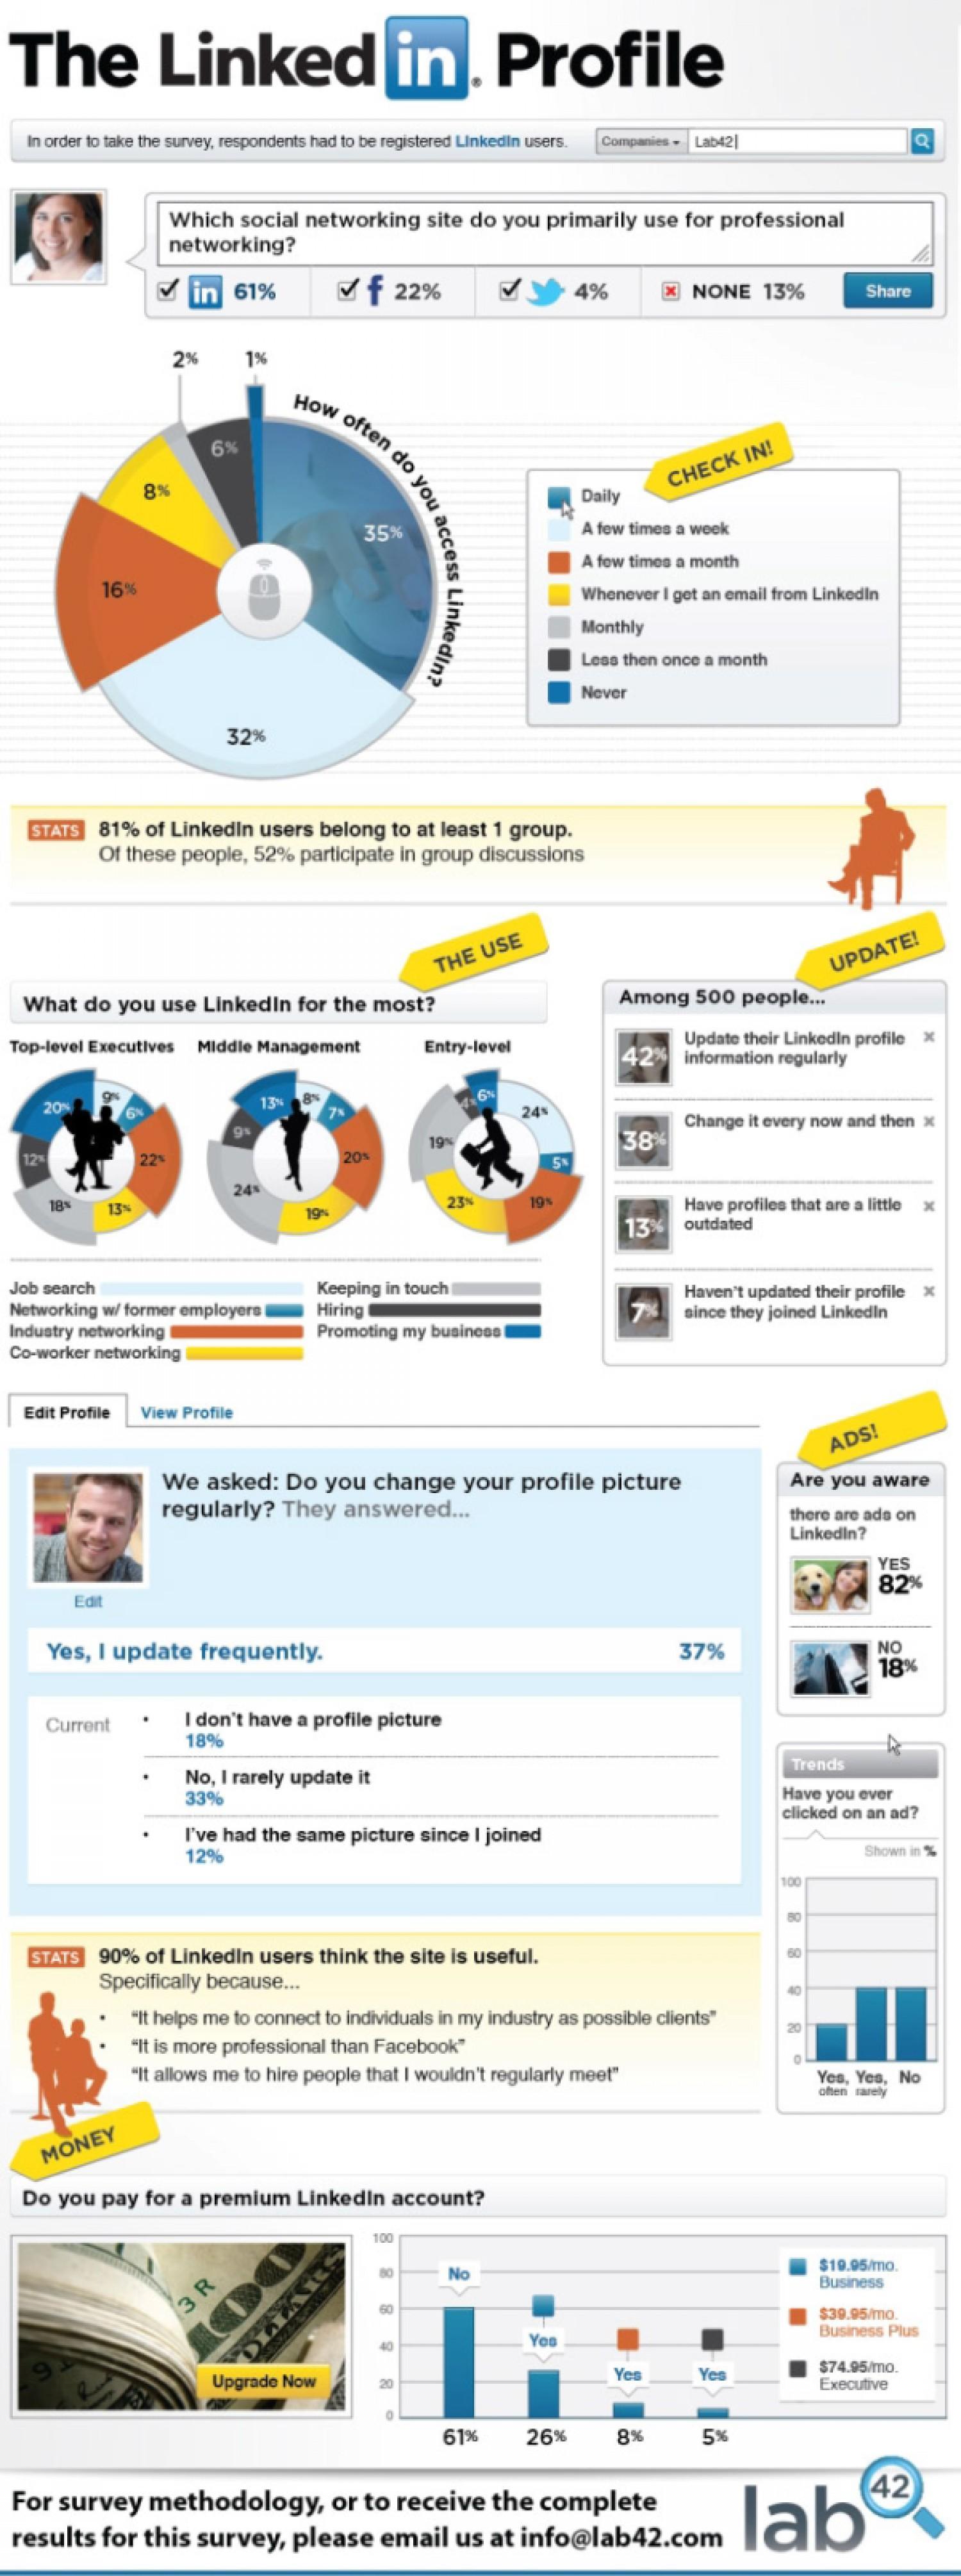 17. LinkedIn Usage Duration